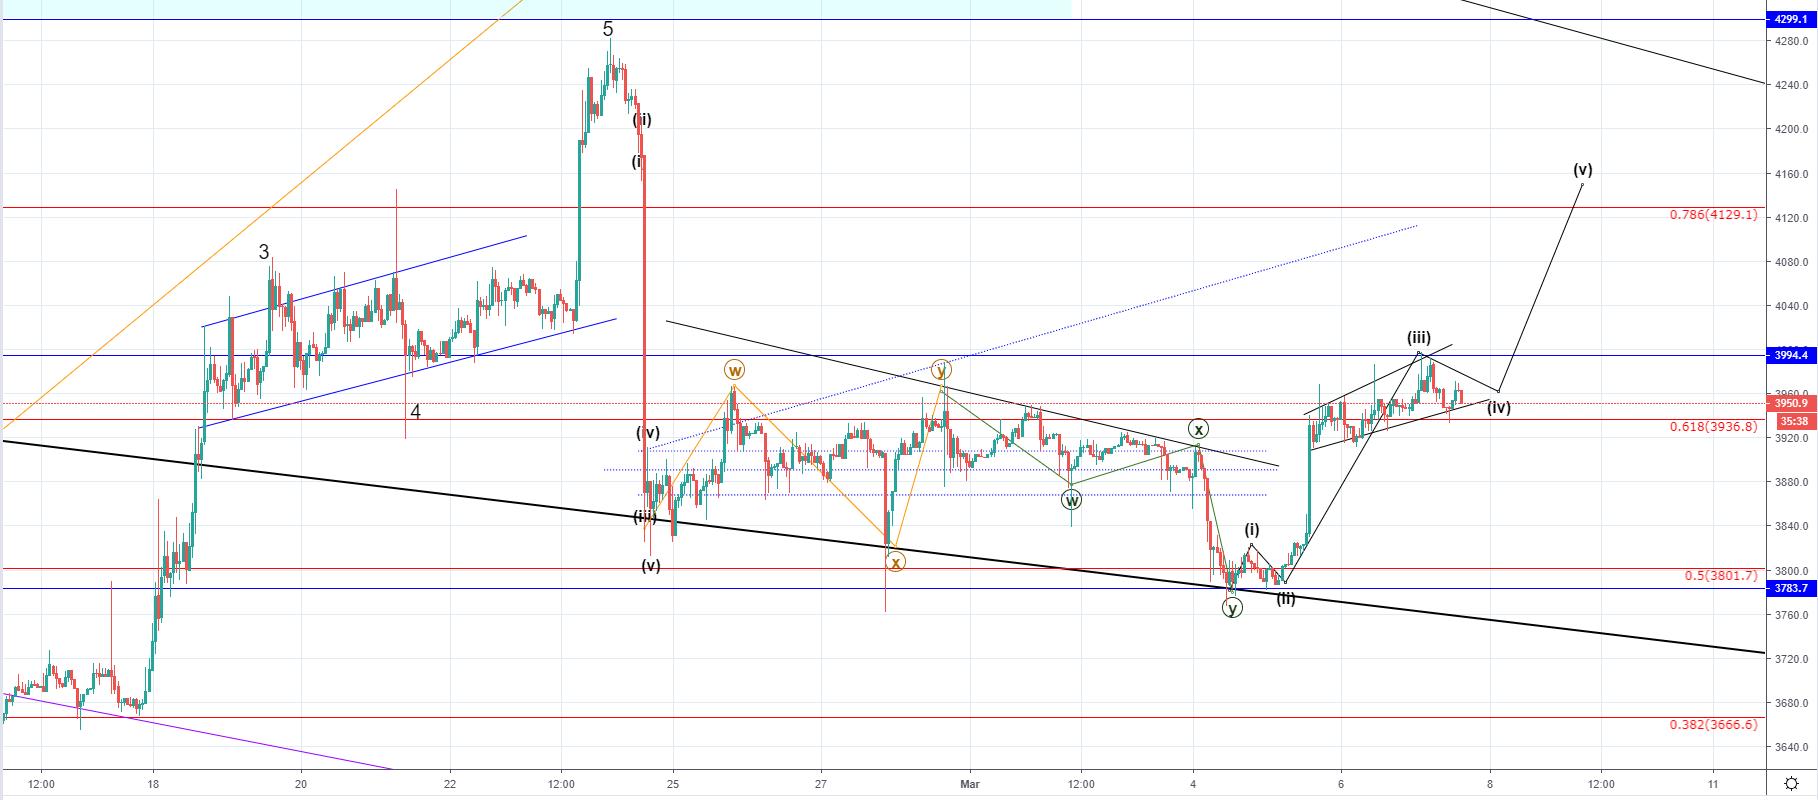 market cap of cryptocurrencies chart